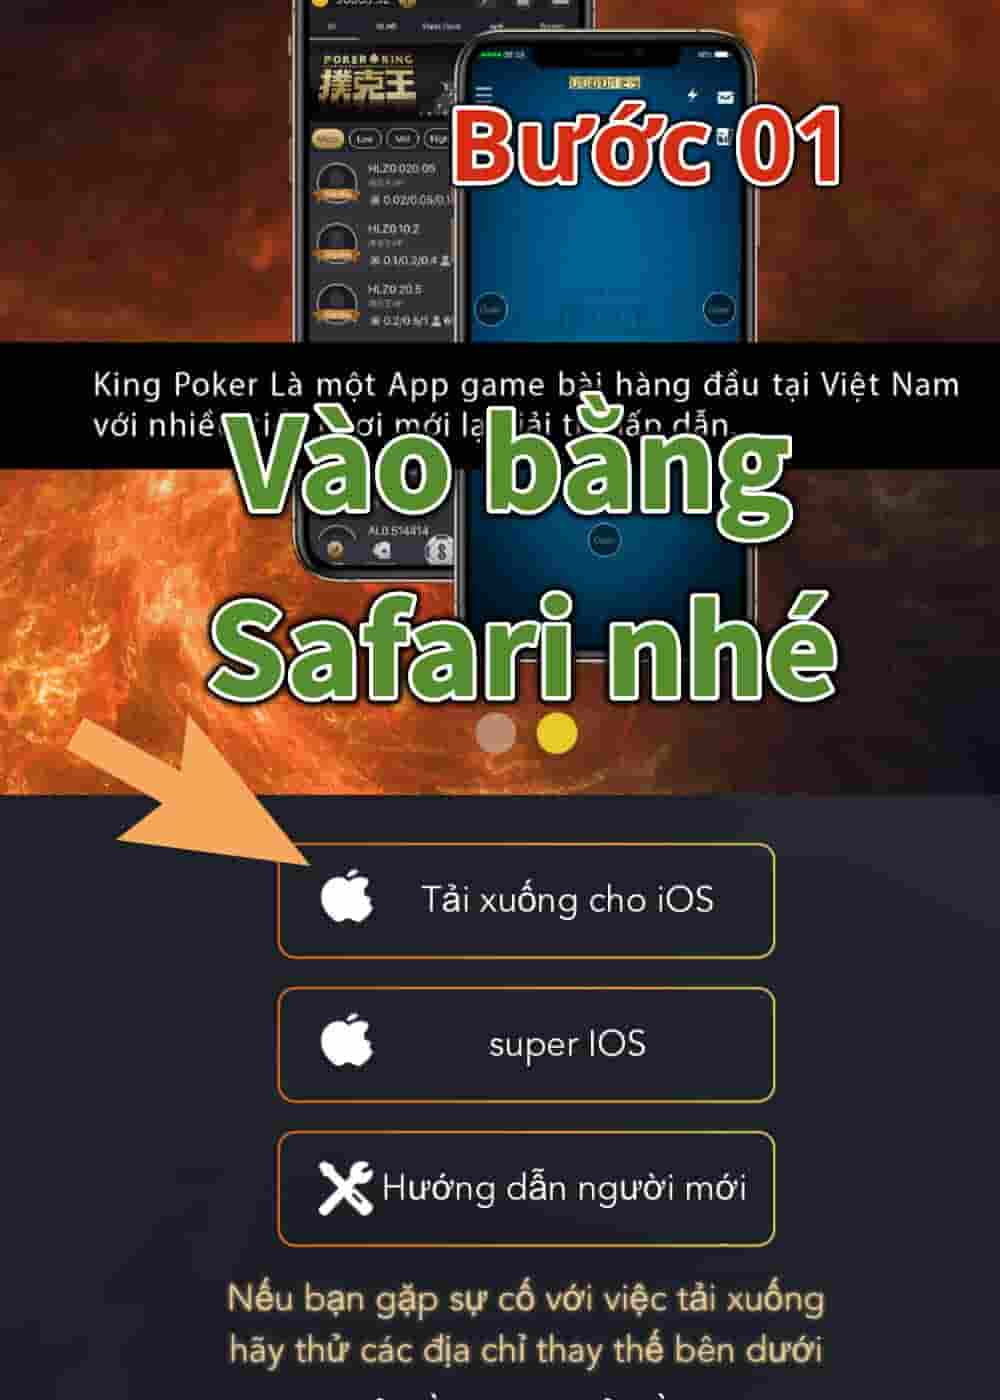 cai poker king tren iphone